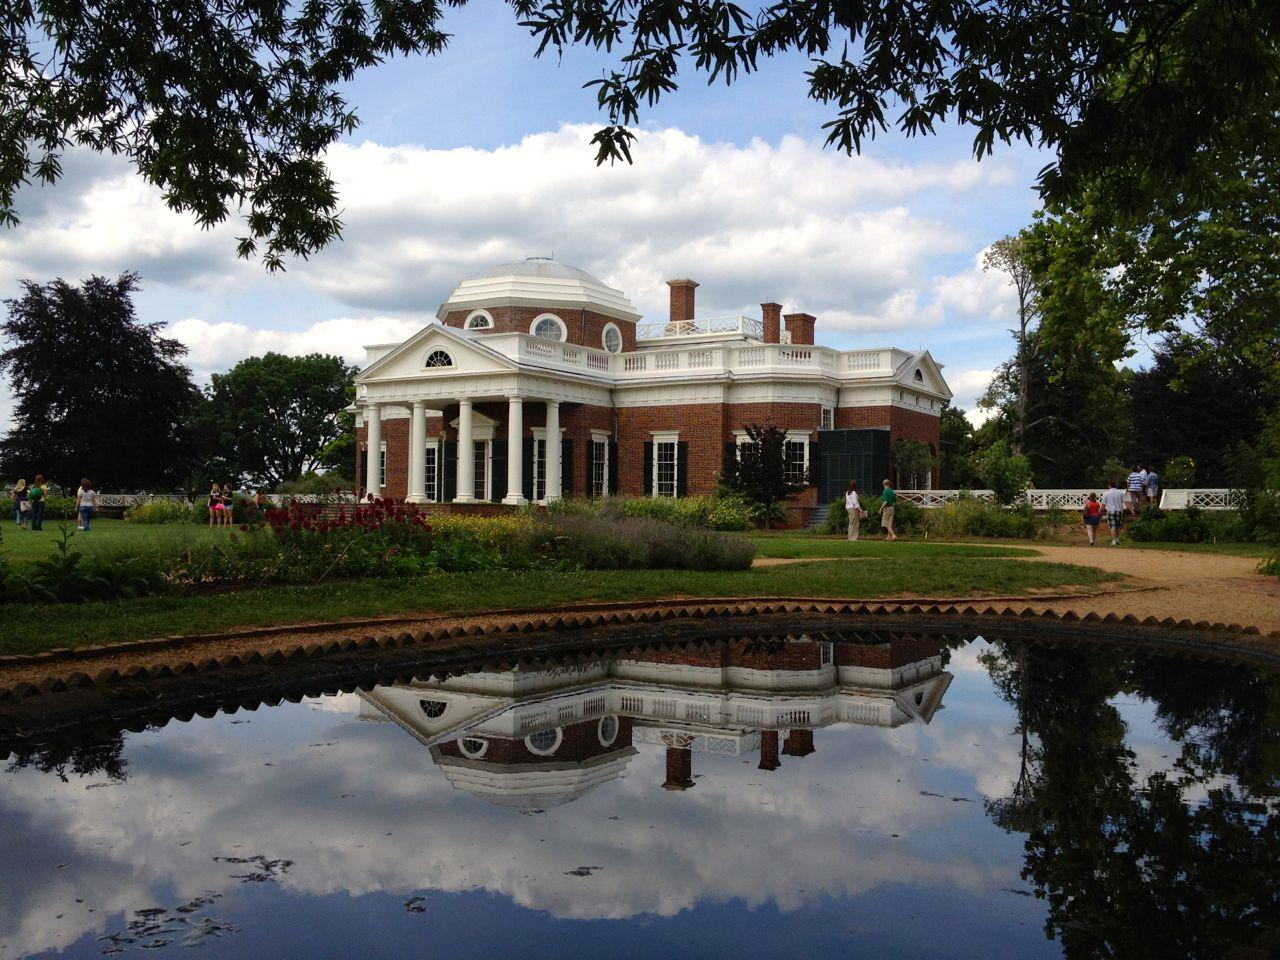 Monticello- Summer Getaways from D.C.